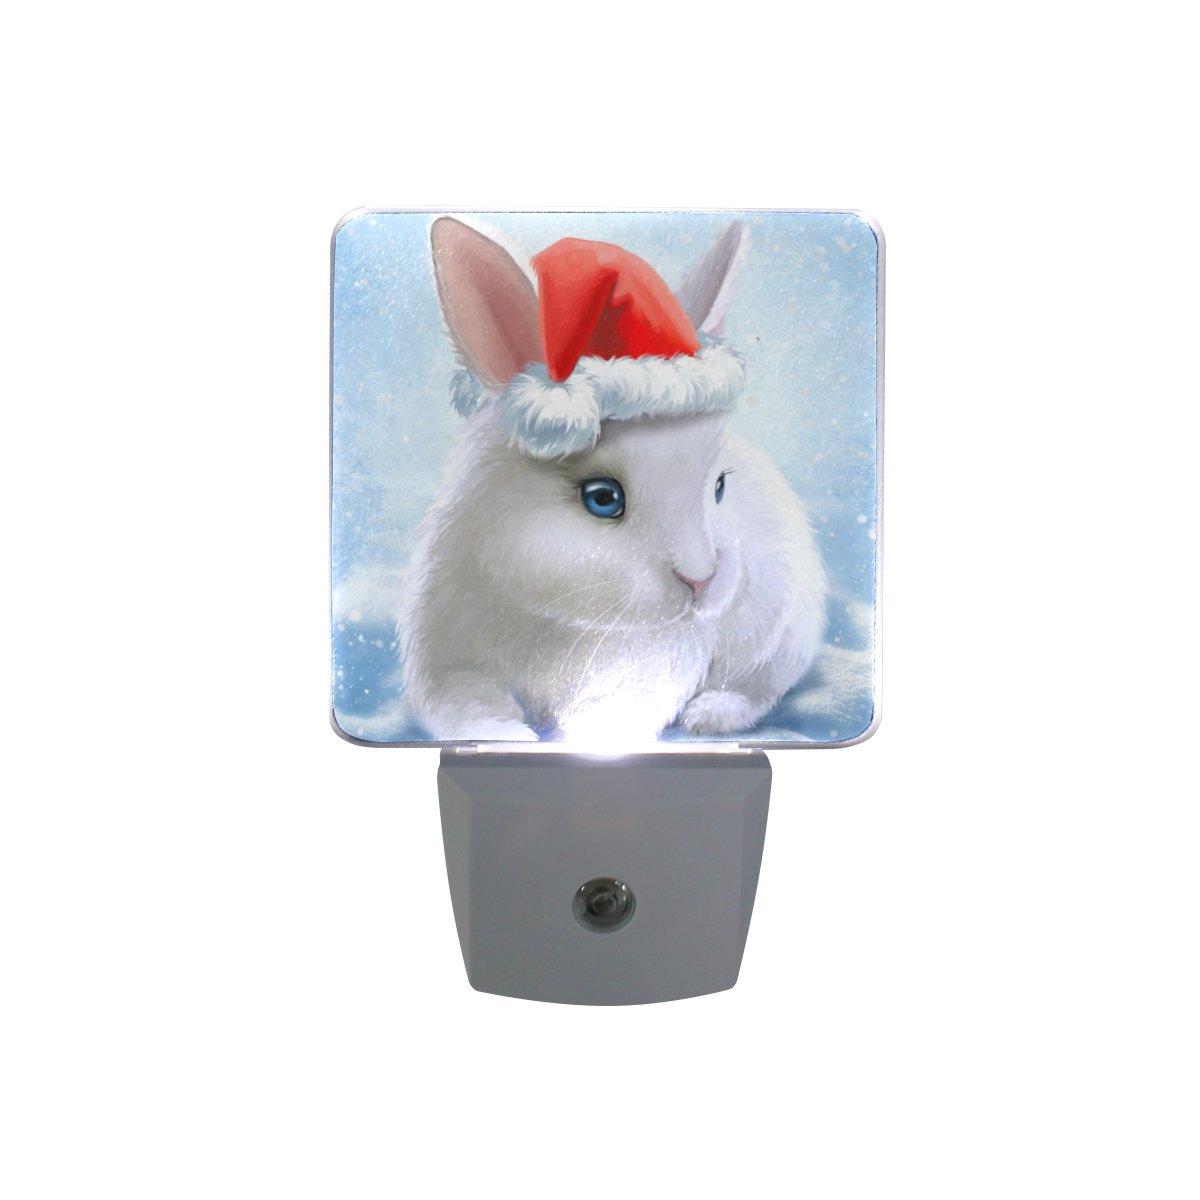 JOYPRINT Led Night Light Cute Animal Rabbit Bunny, Auto Senor Dusk to Dawn Night Light Plug in for Kids Baby Girls Boys Adults Room by JOYPRINT (Image #3)